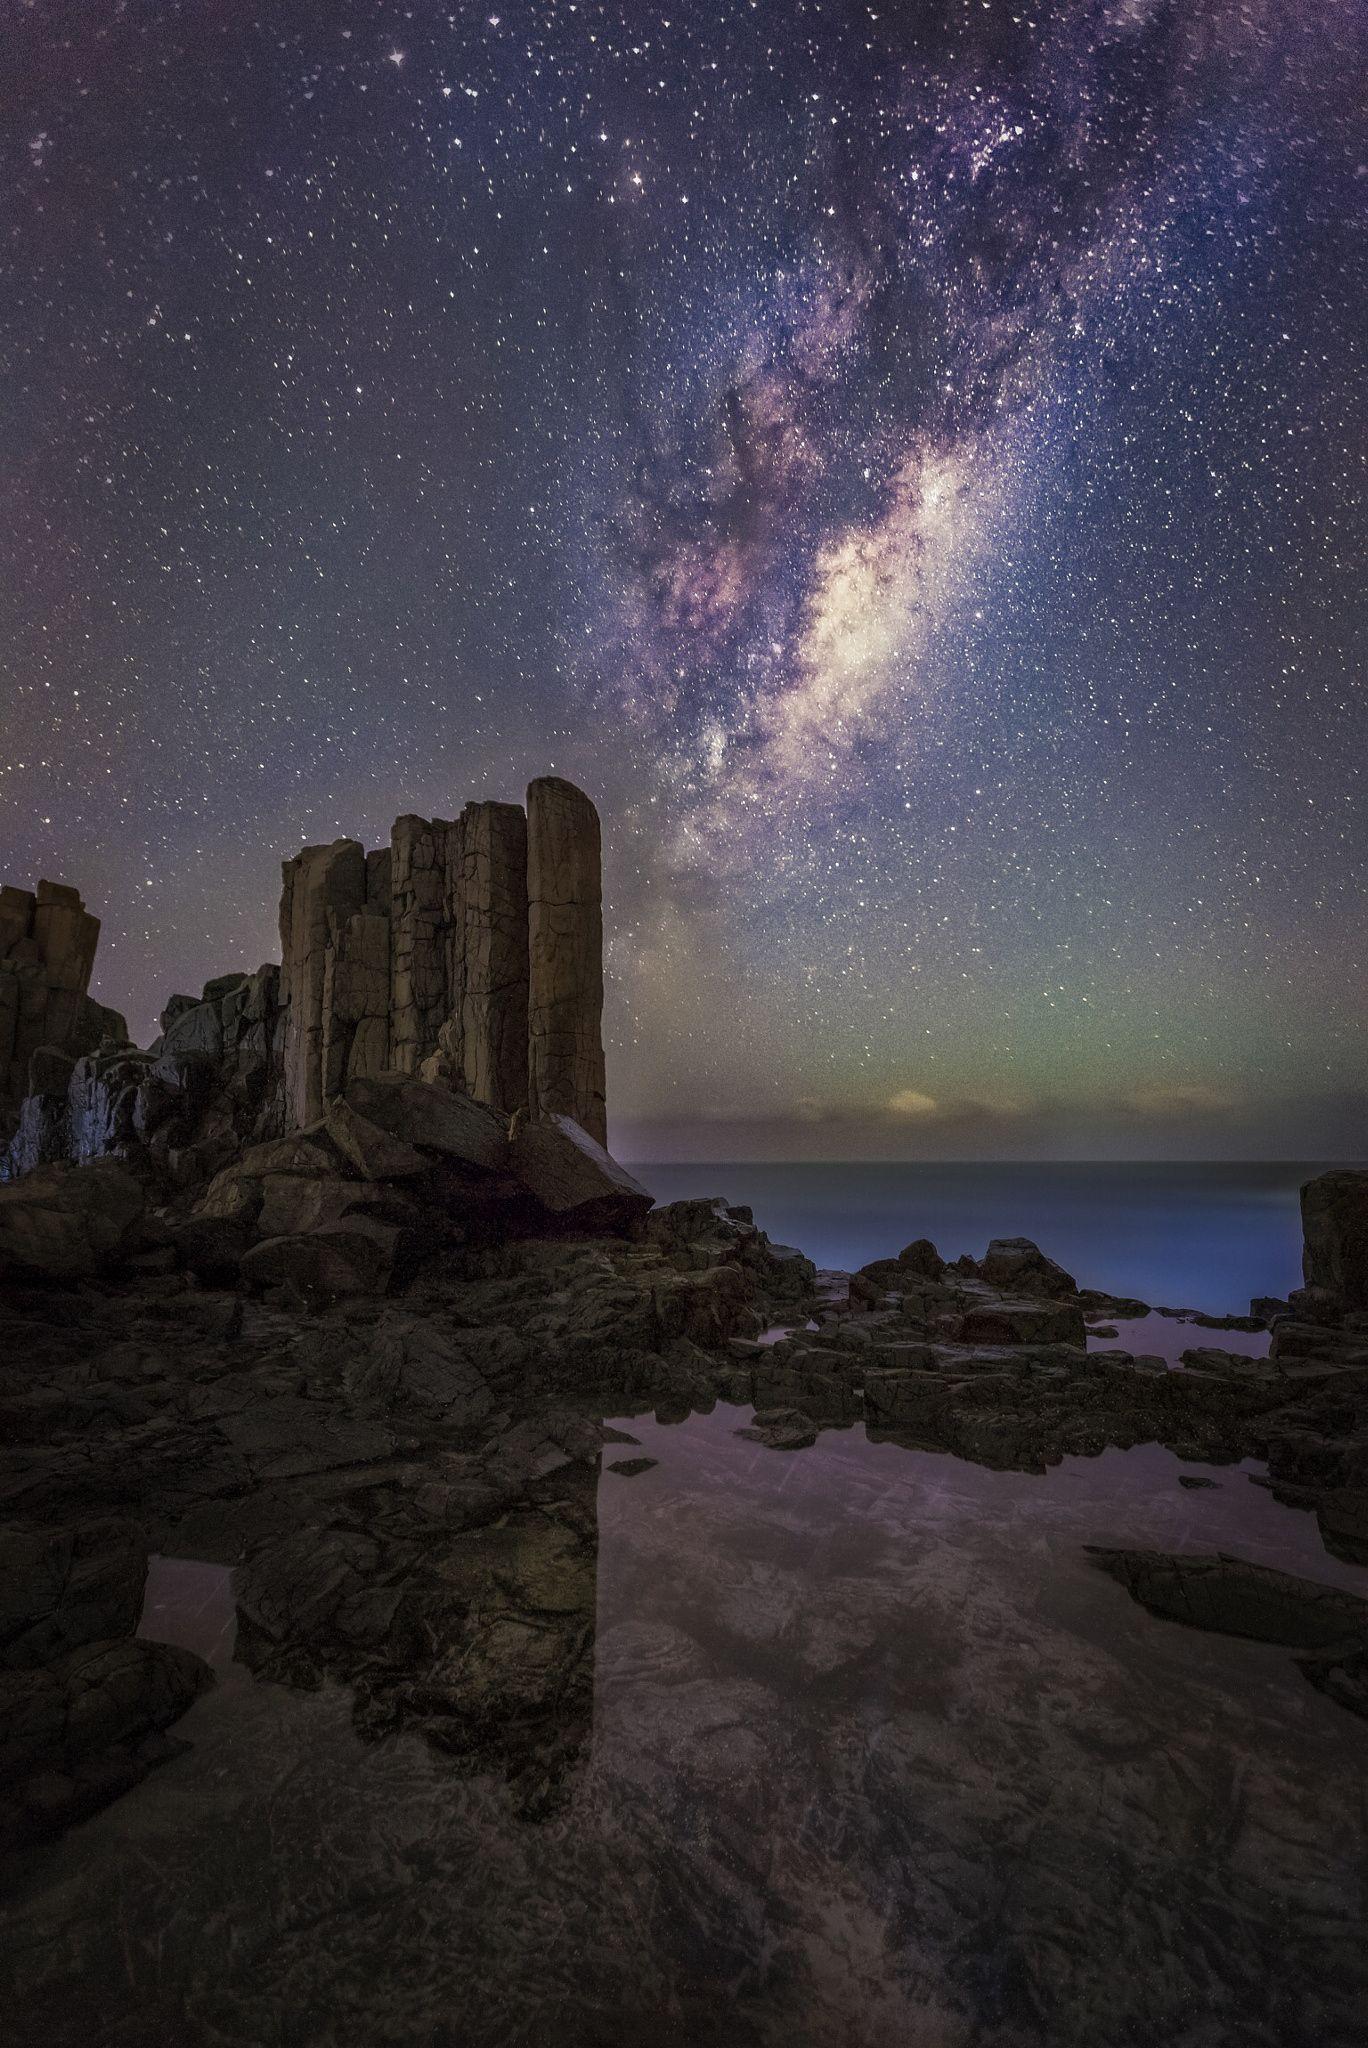 The Starry Night by Tim Fan on 500px